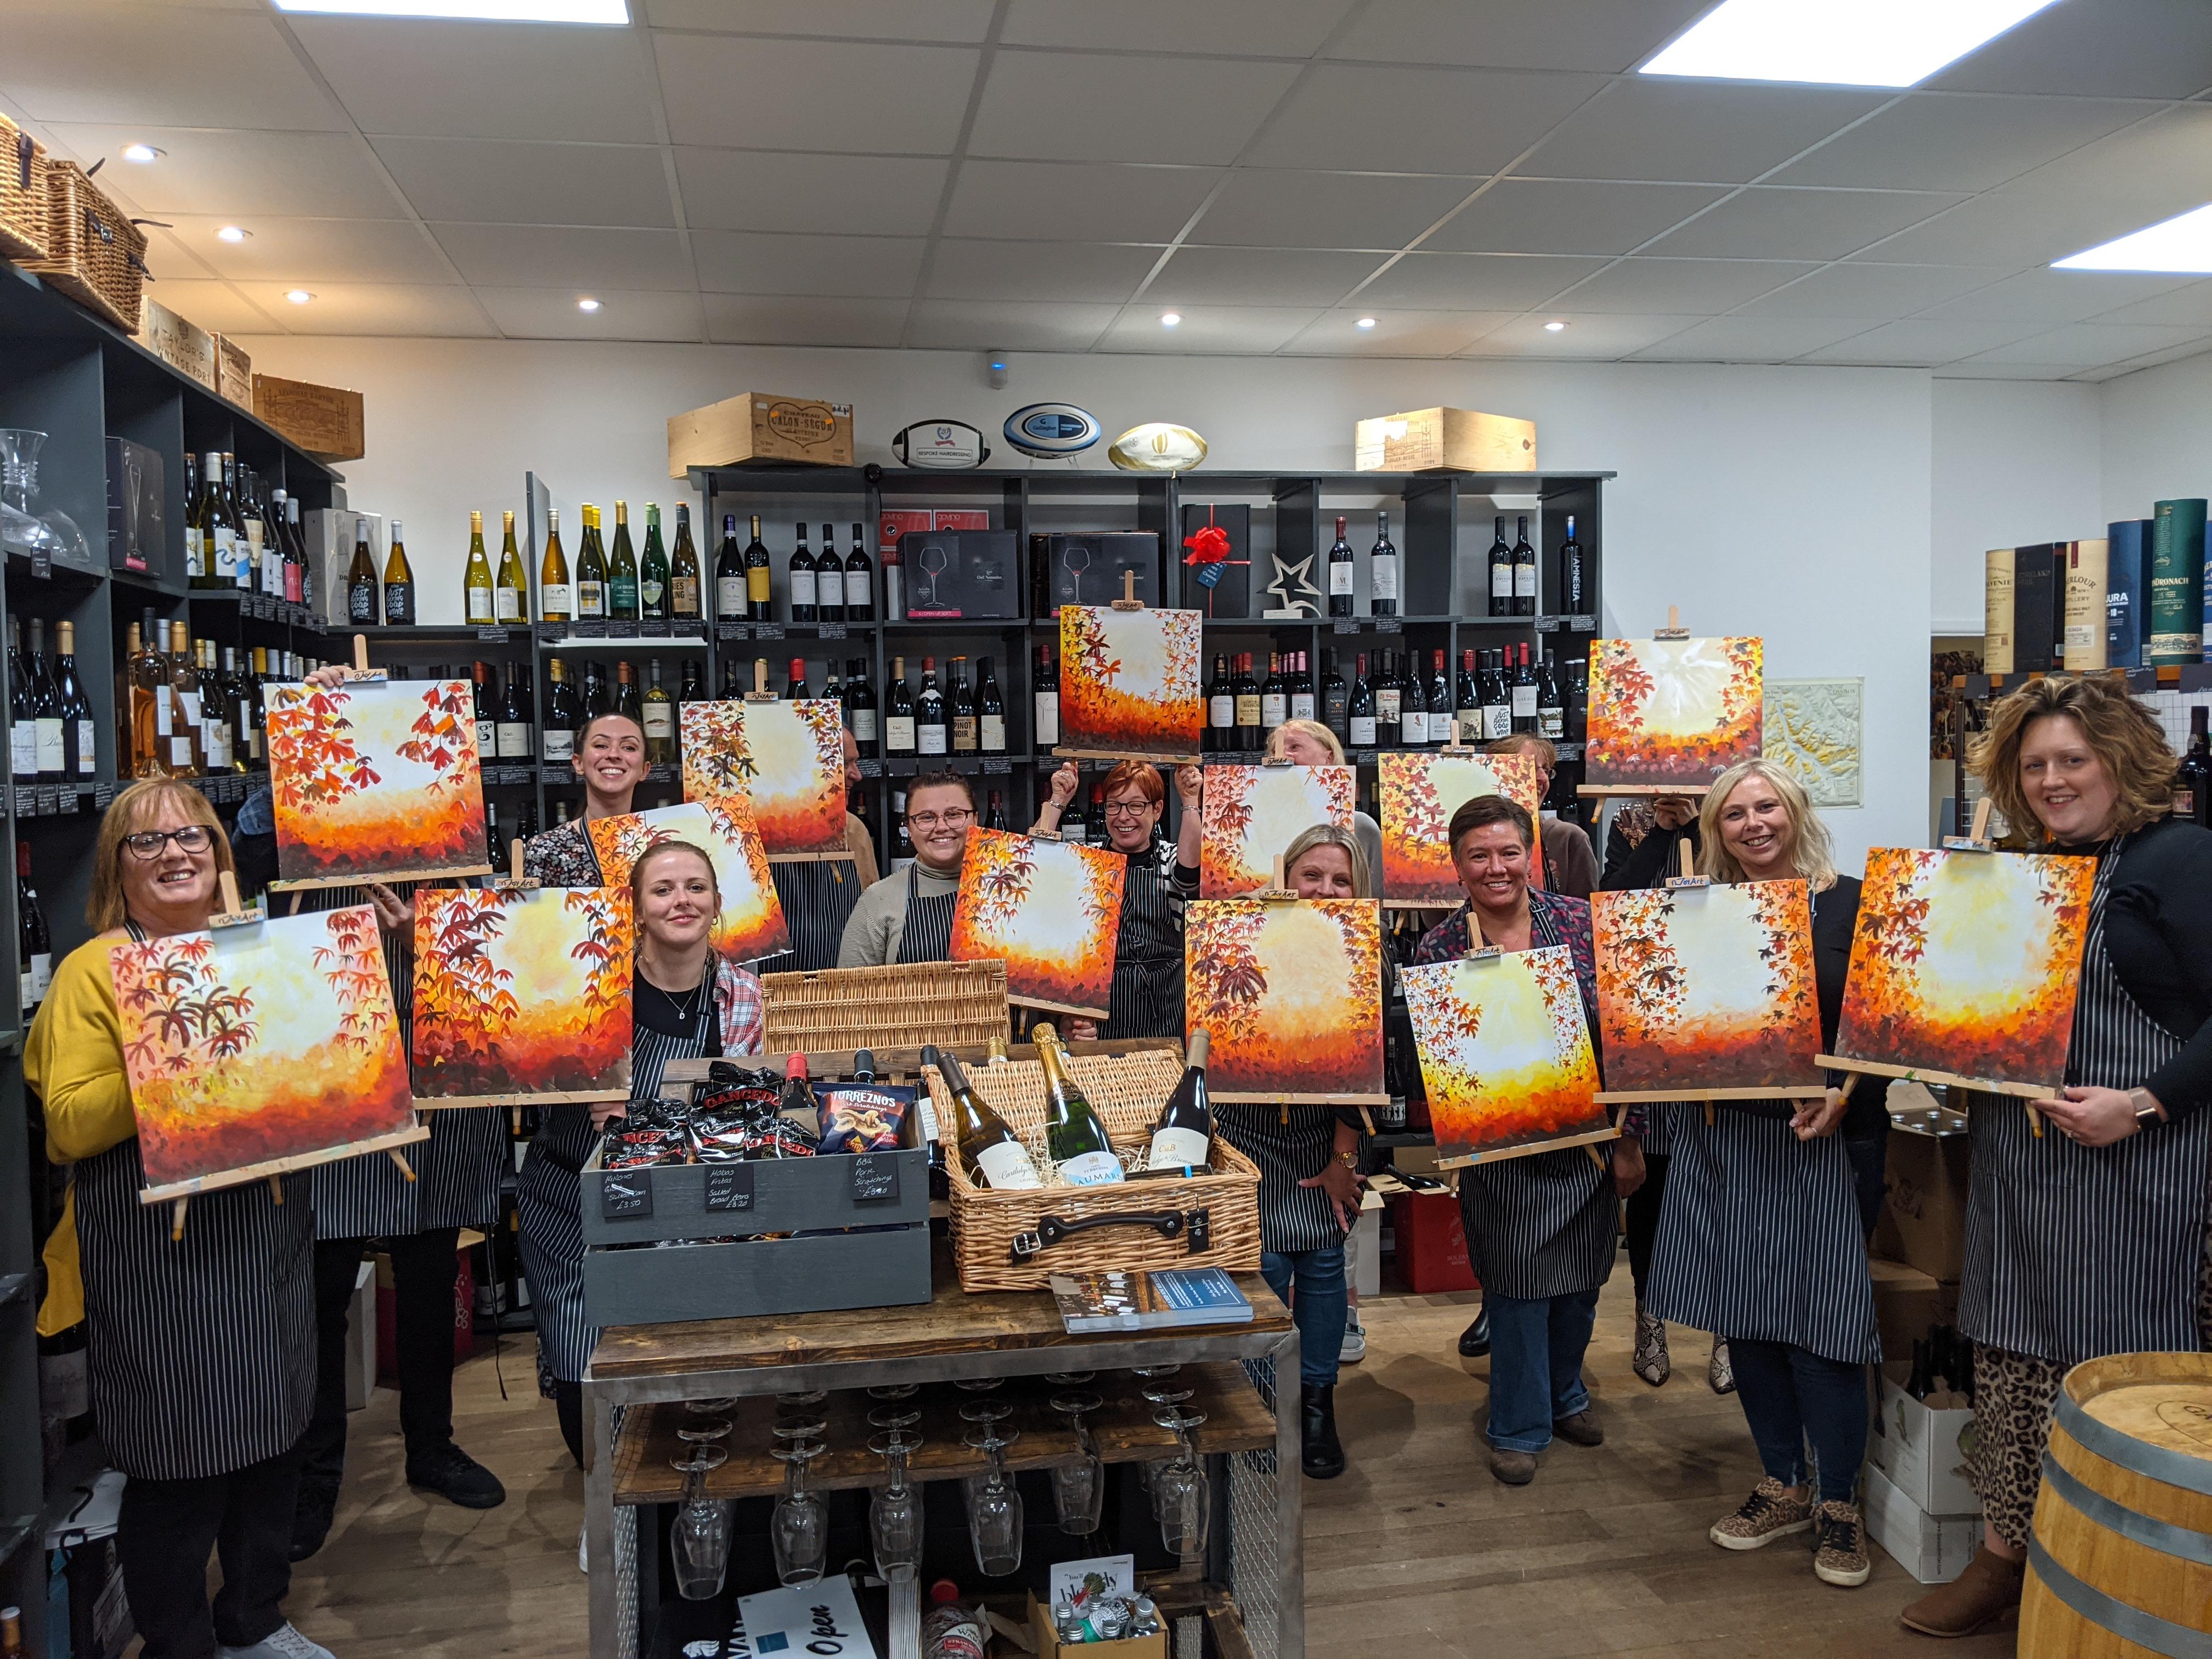 guests_maple_sunburst_paintings_at_gallachers.jpg